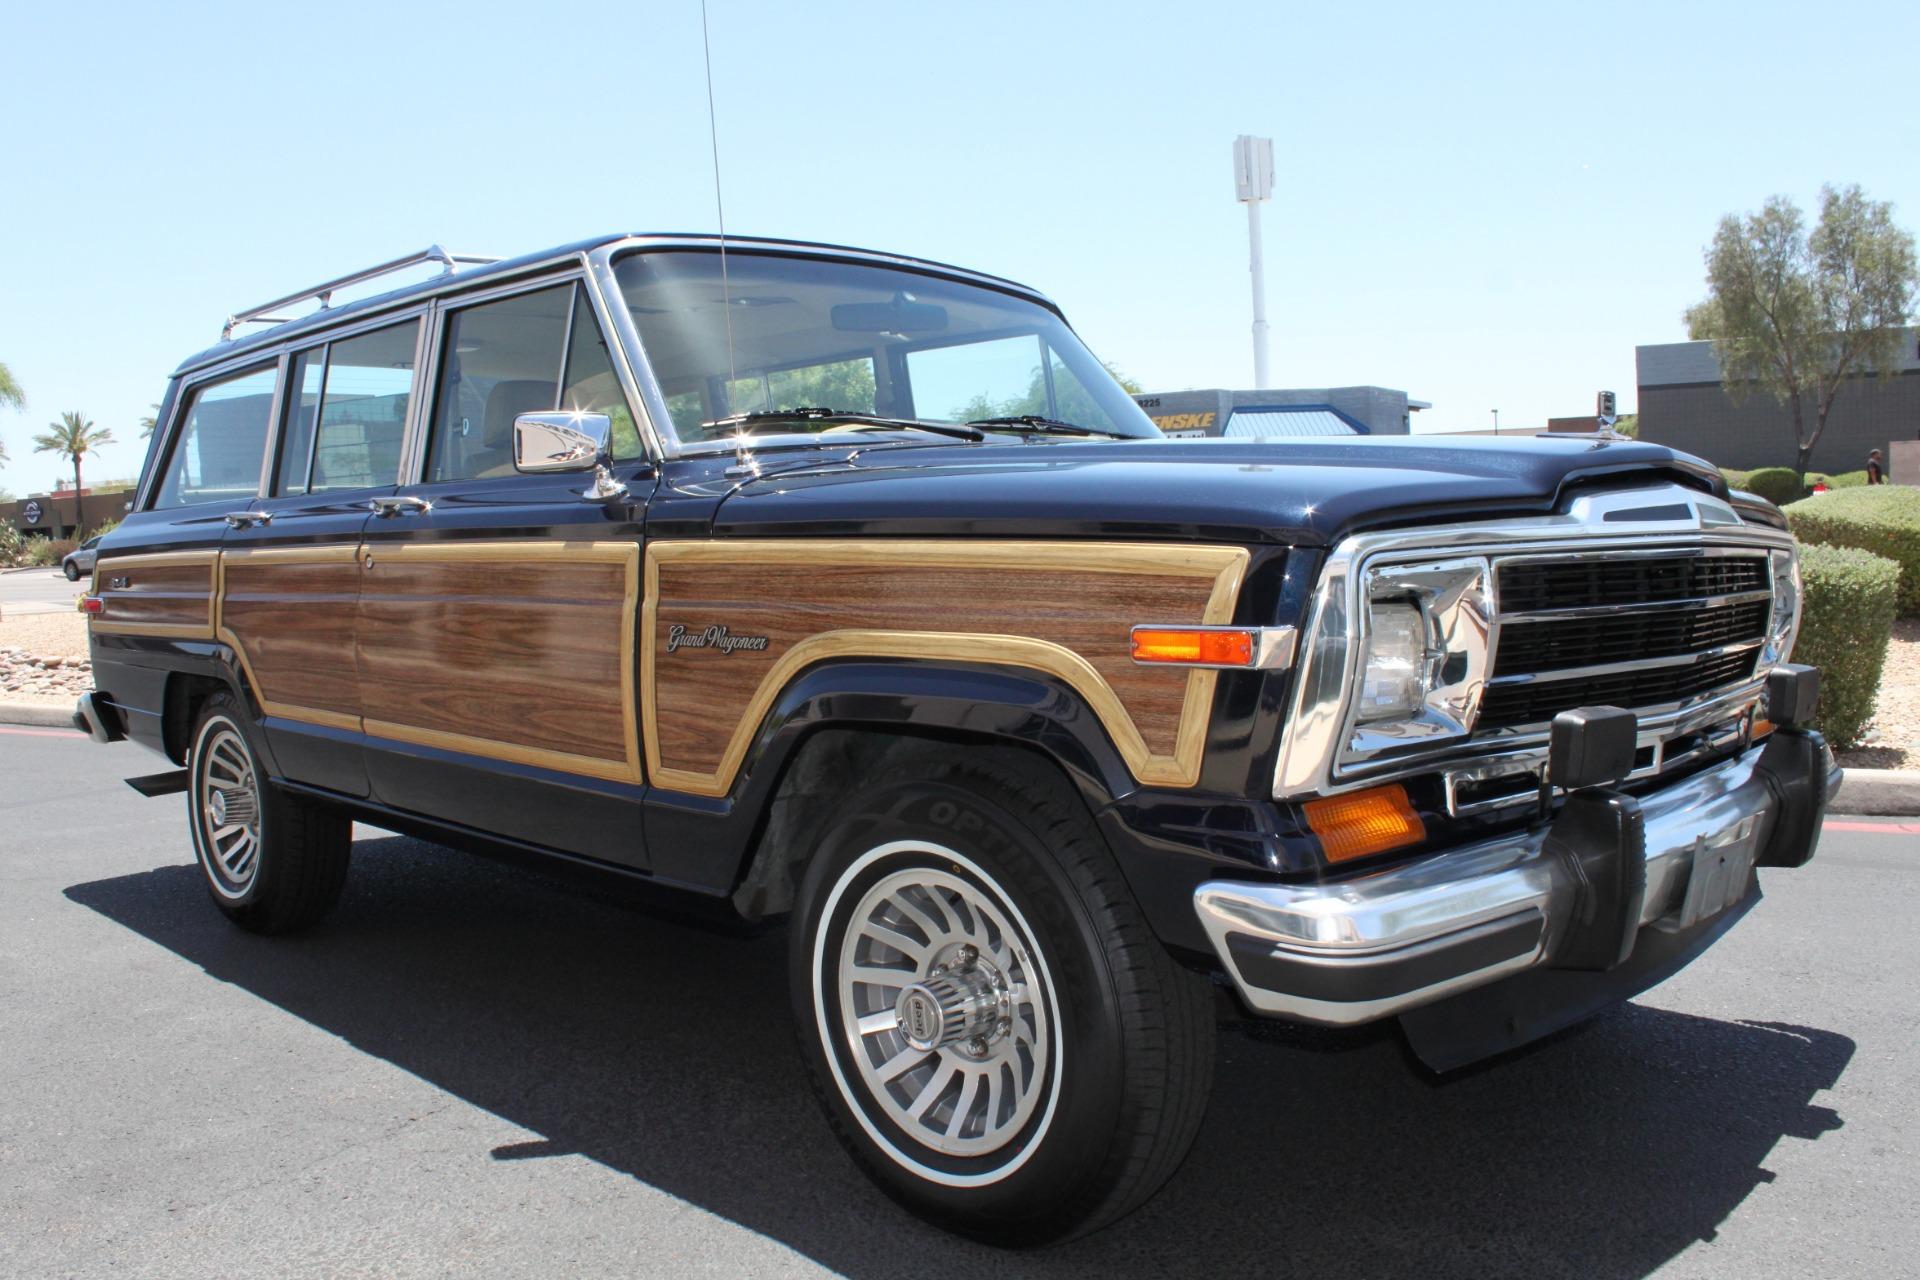 Used-1990-Jeep-Grand-Wagoneer-4X4-Mercedes-Benz